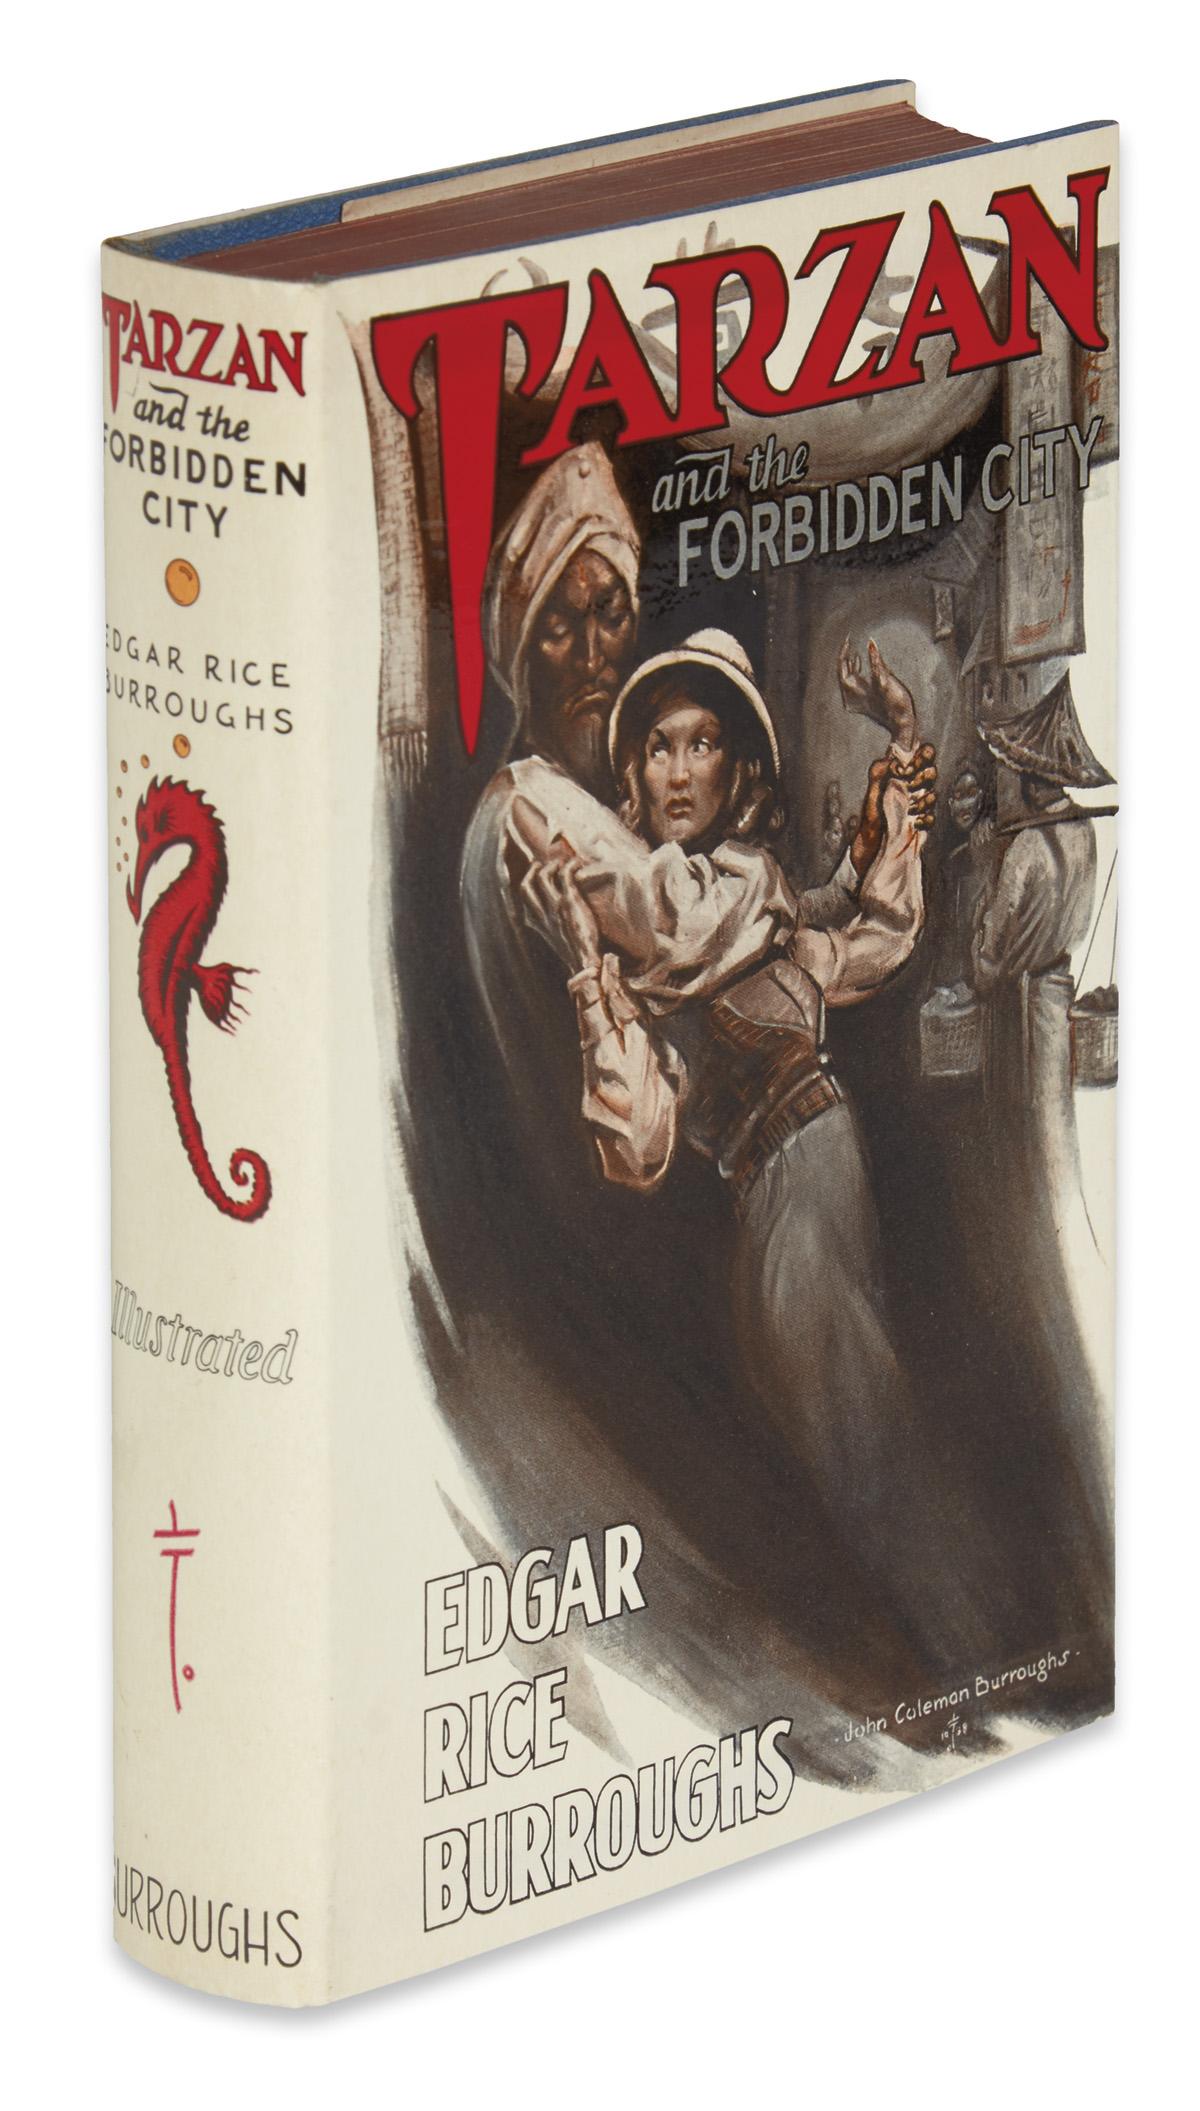 BURROUGHS-EDGAR-RICE-Tarzan-and-the-Forbidden-City